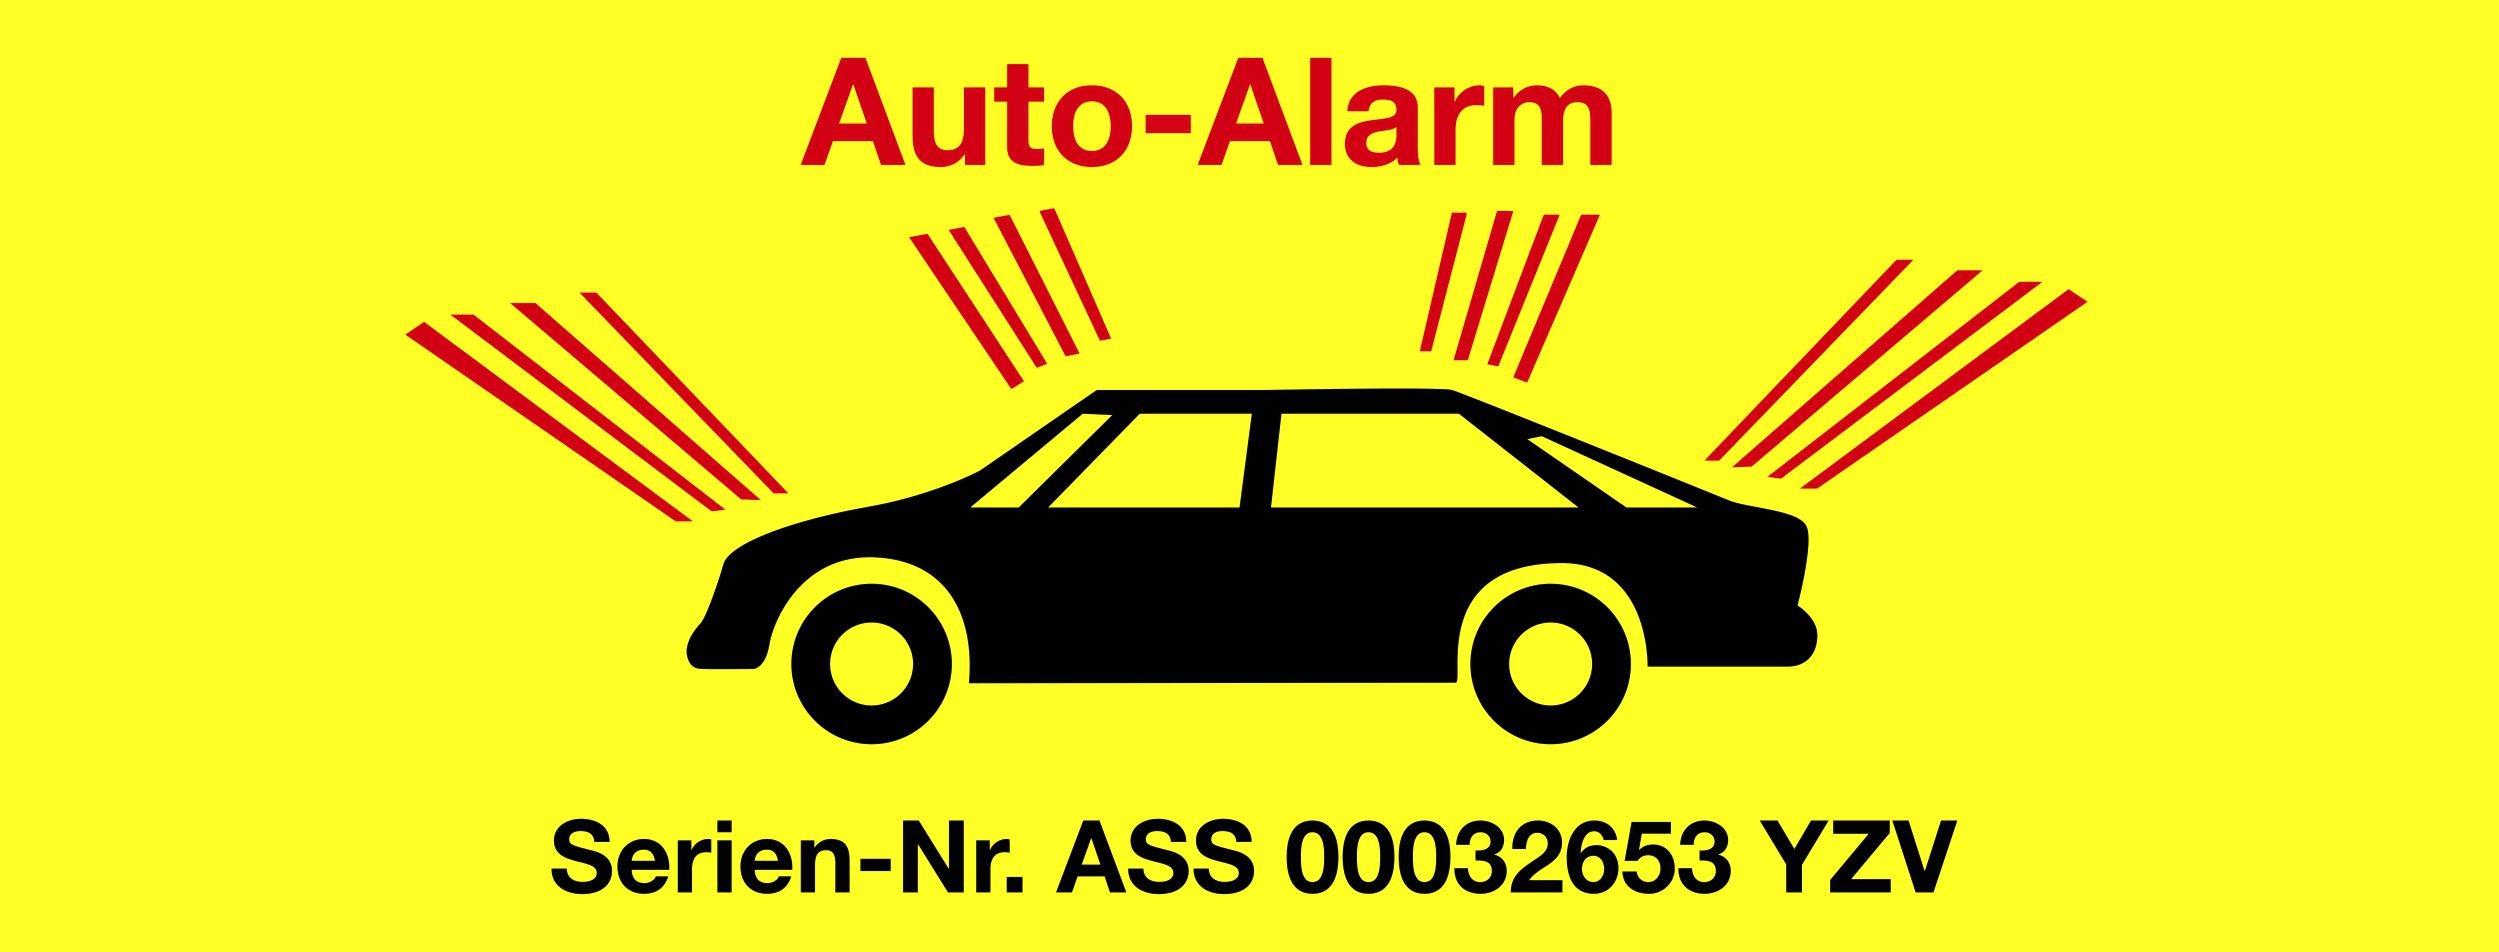 Aufkleber Auto-Alarm – Bild 1